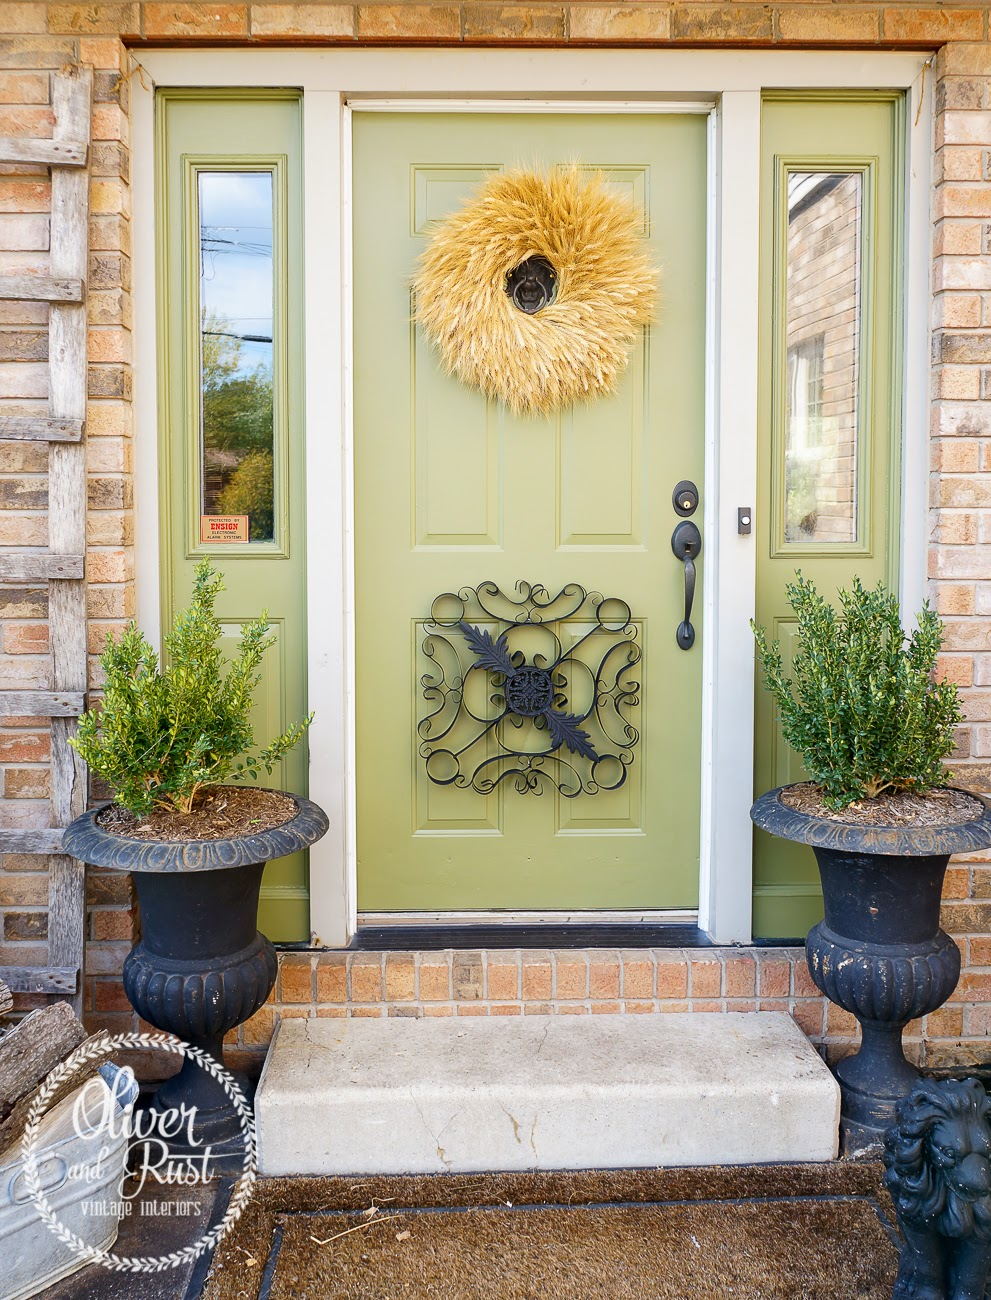 Stunning green door - Oliver and Rust